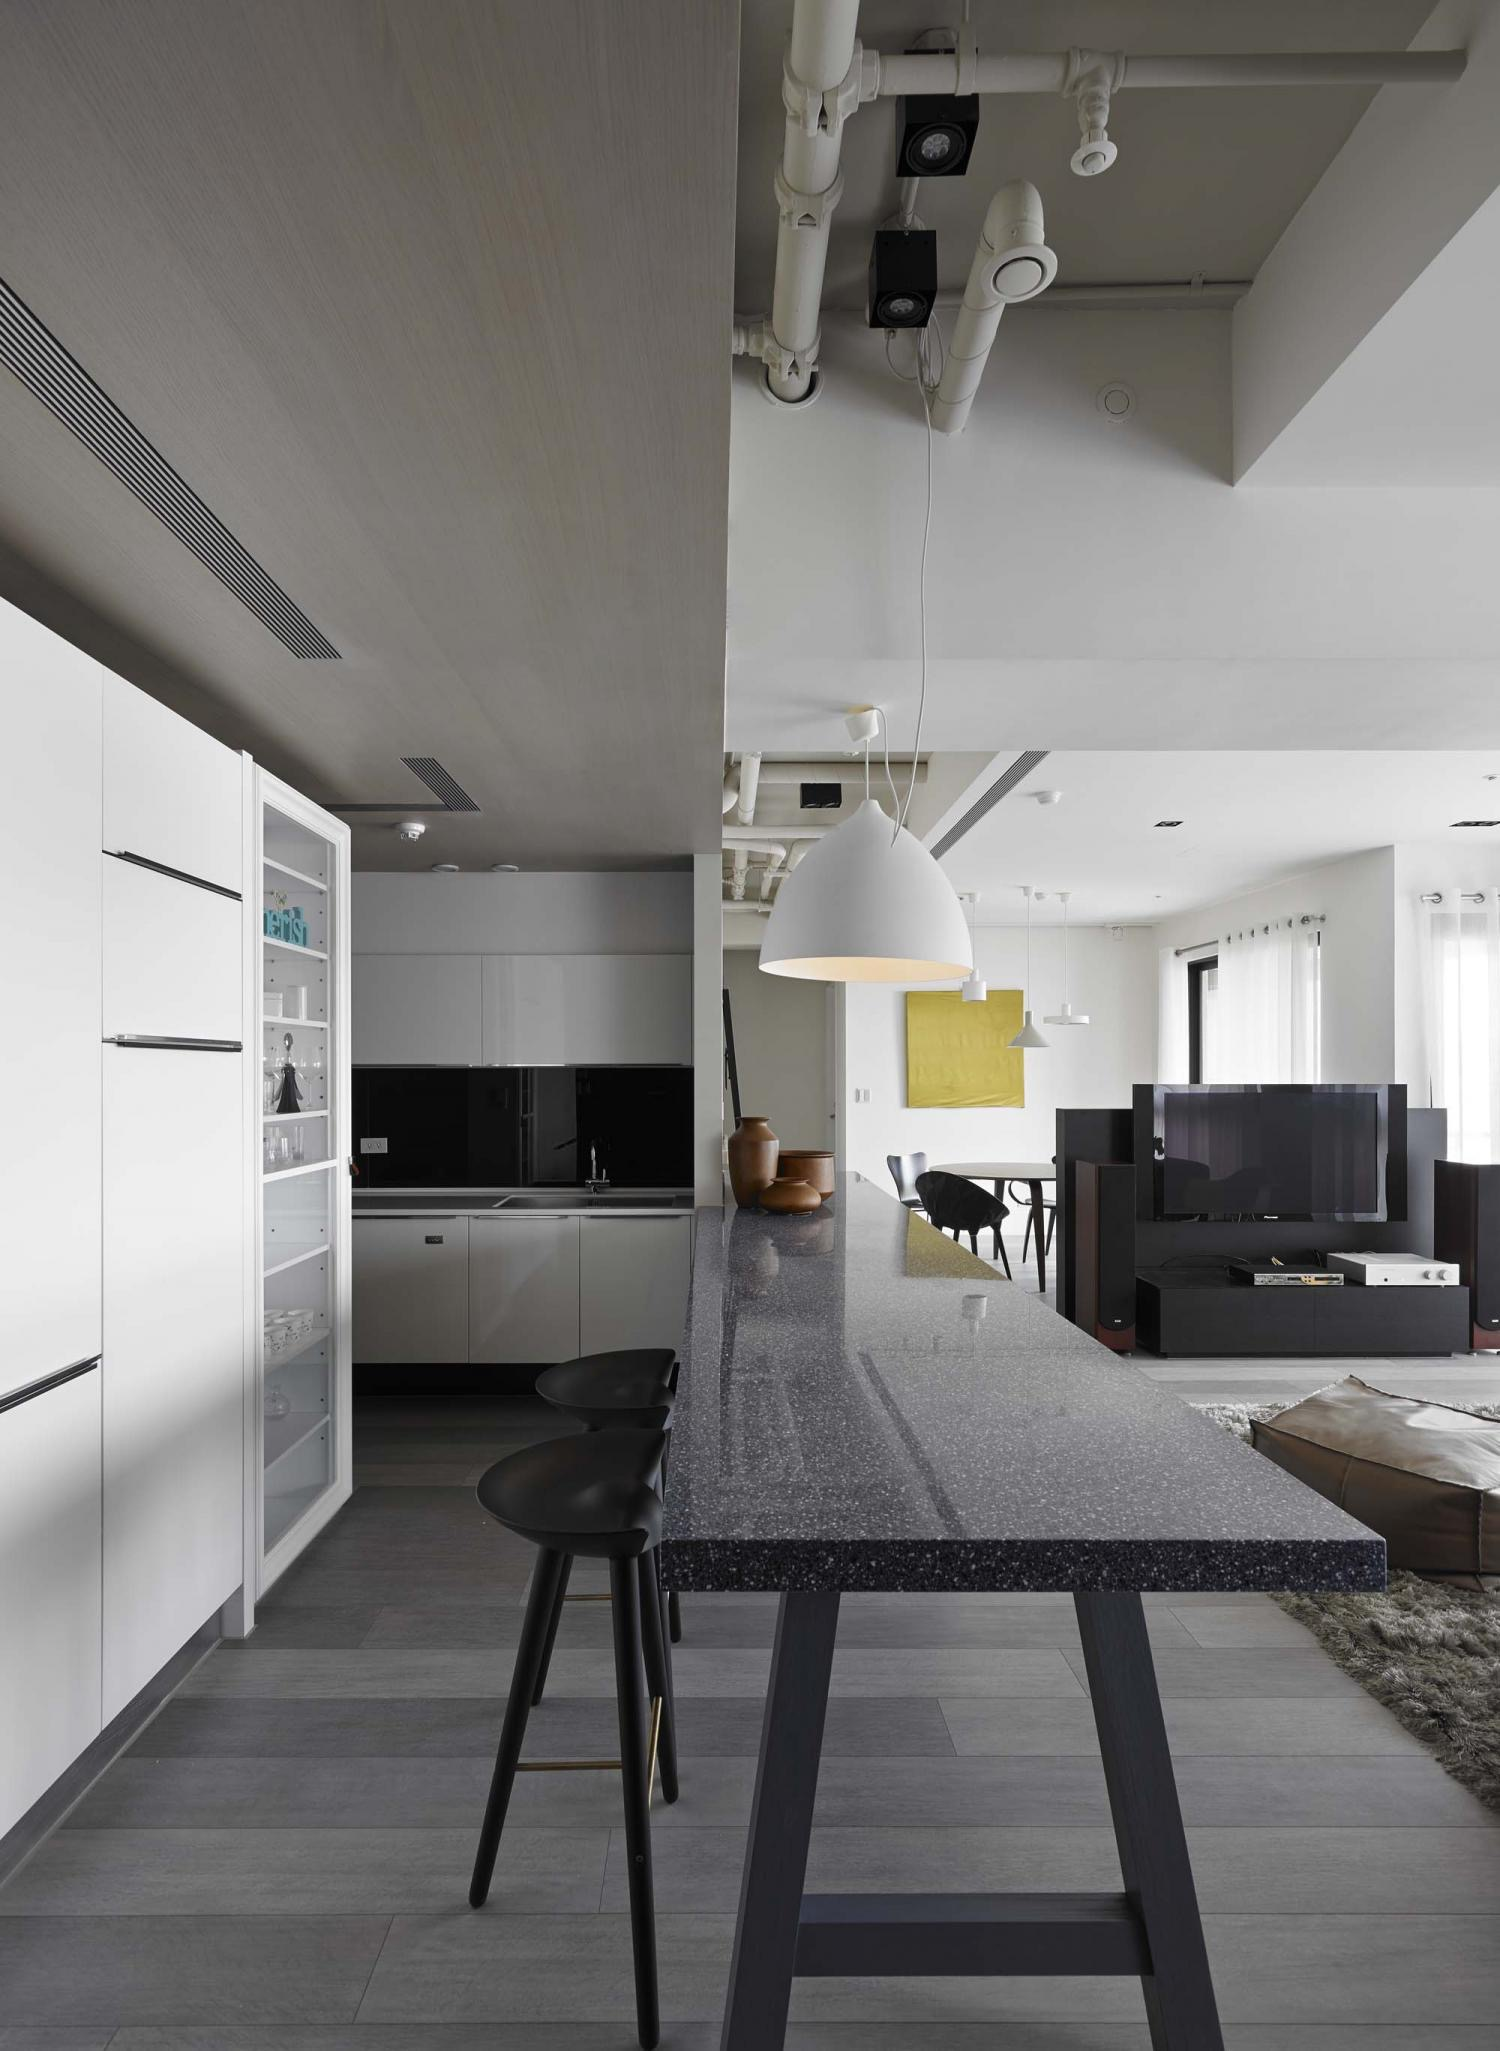 Interior Image 315